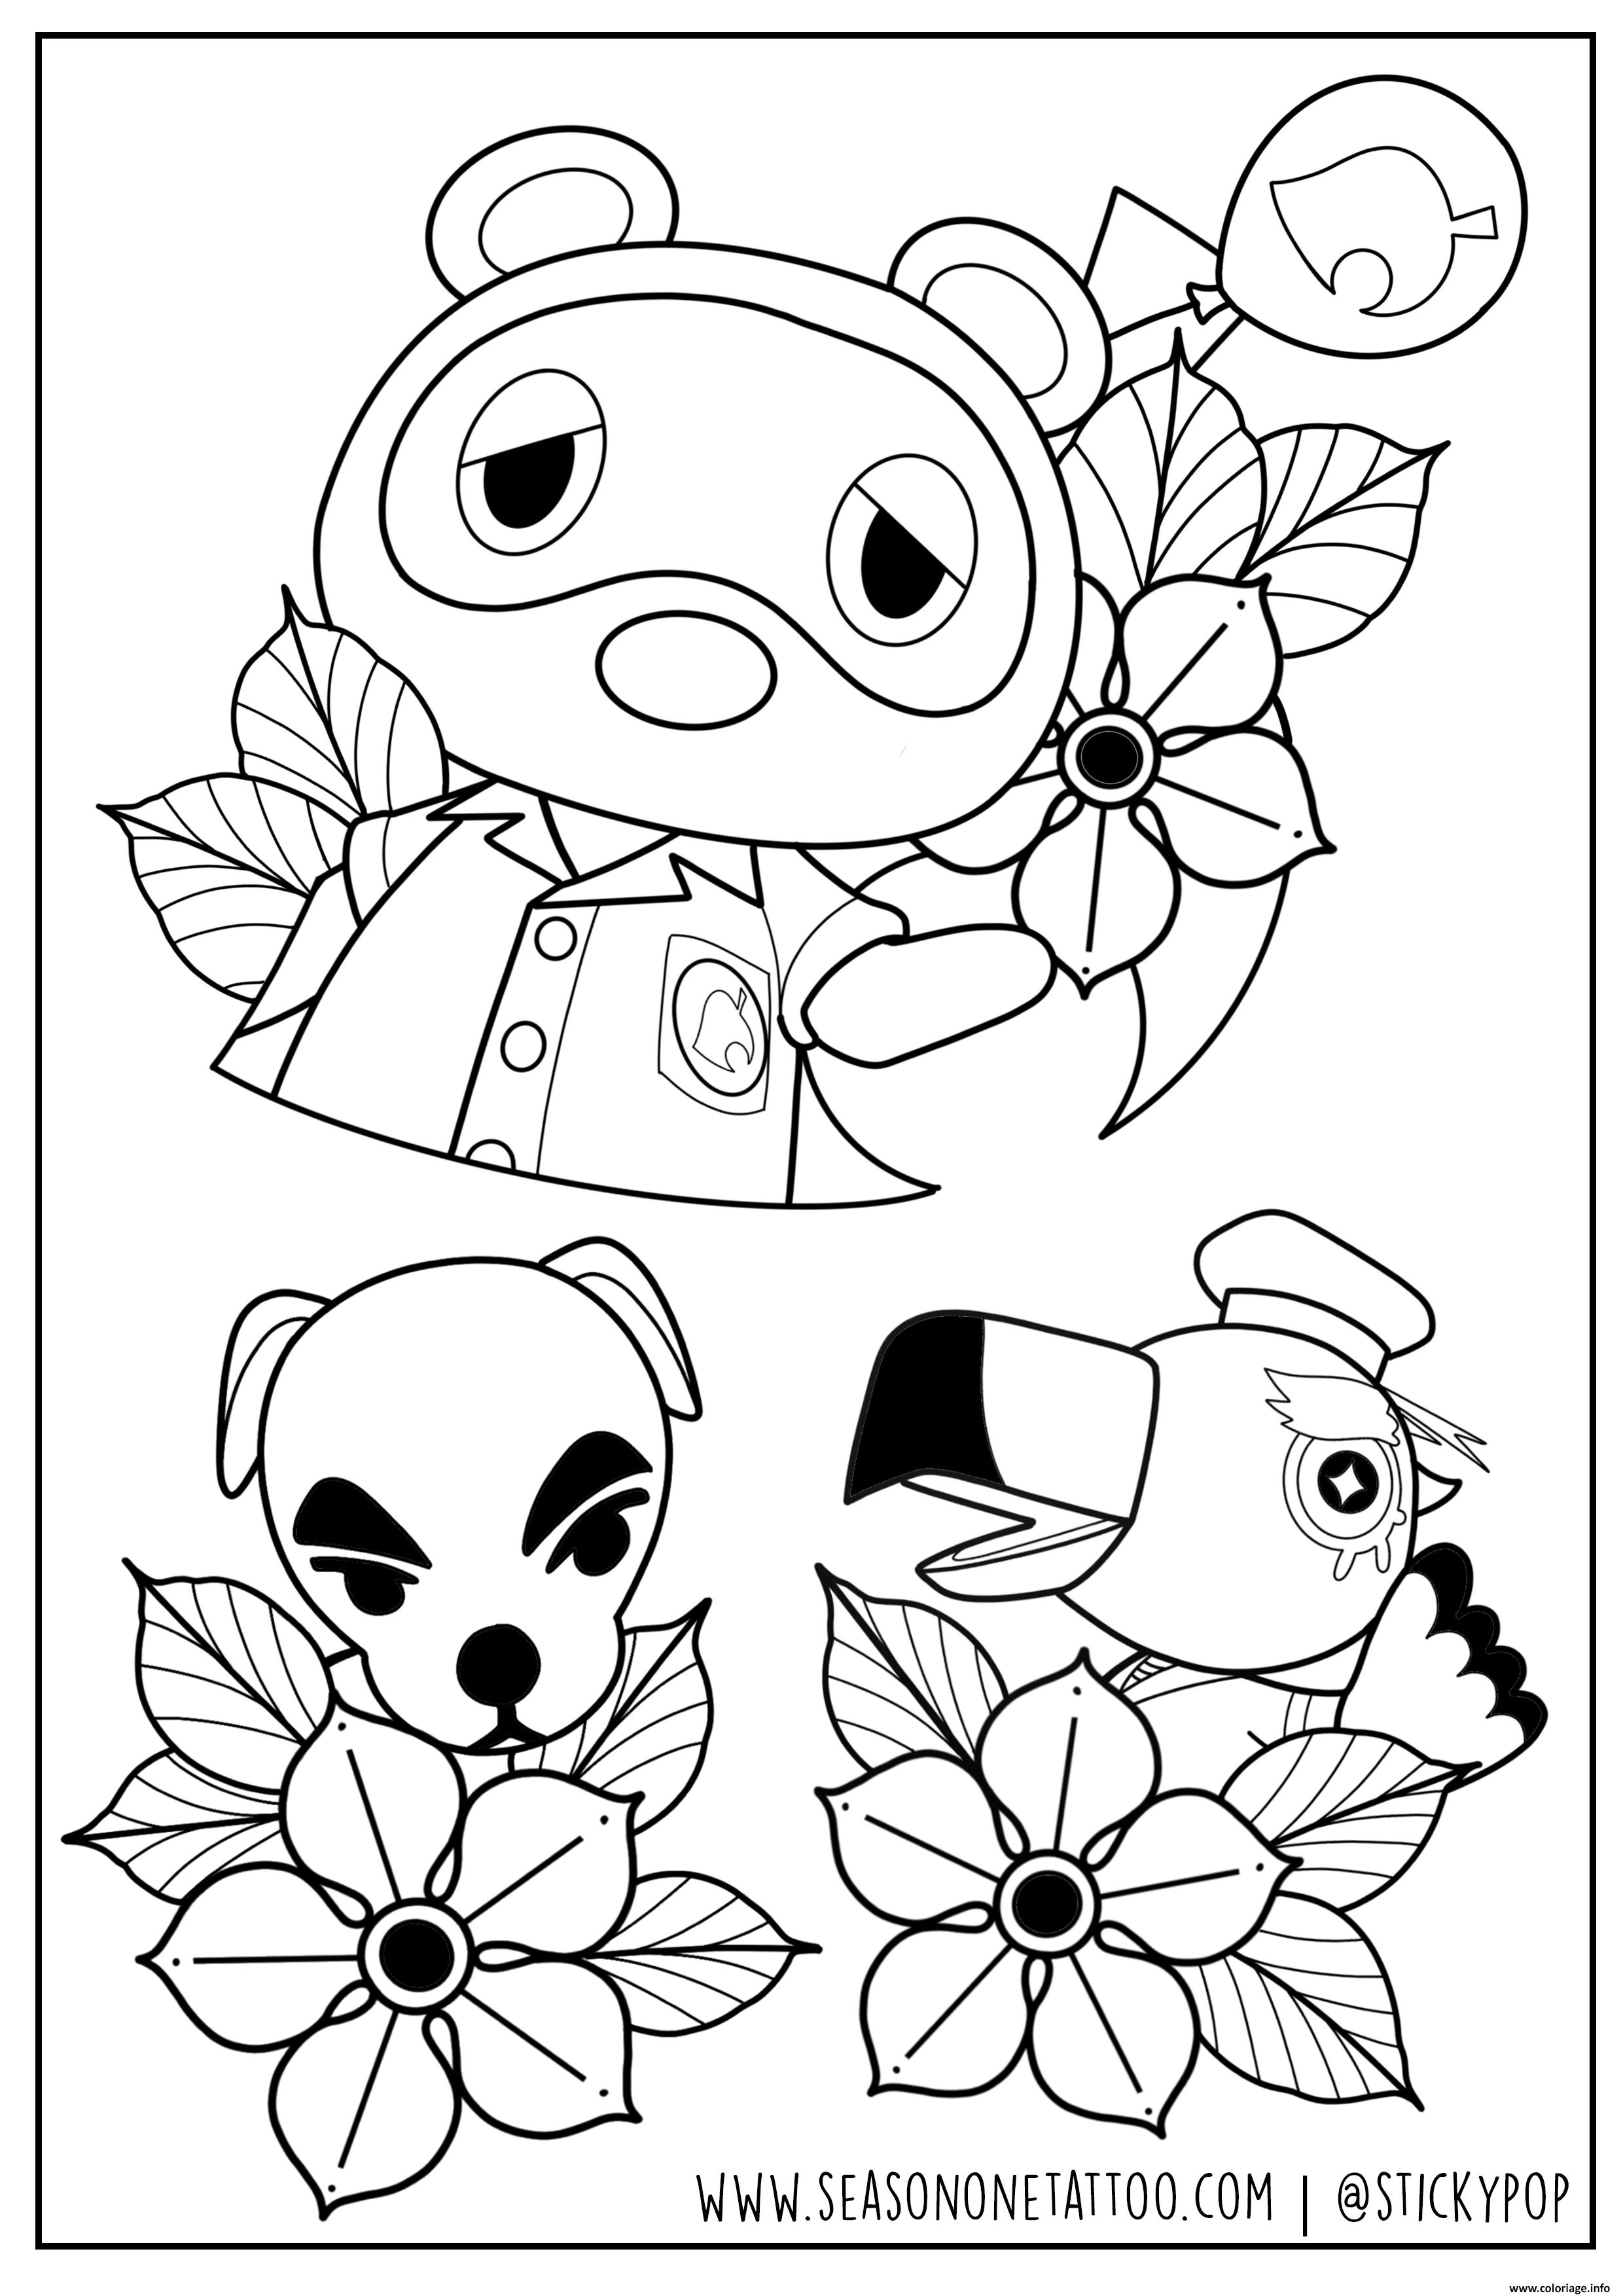 Dessin Animal Crossing by Stickypop Coloriage Gratuit à Imprimer